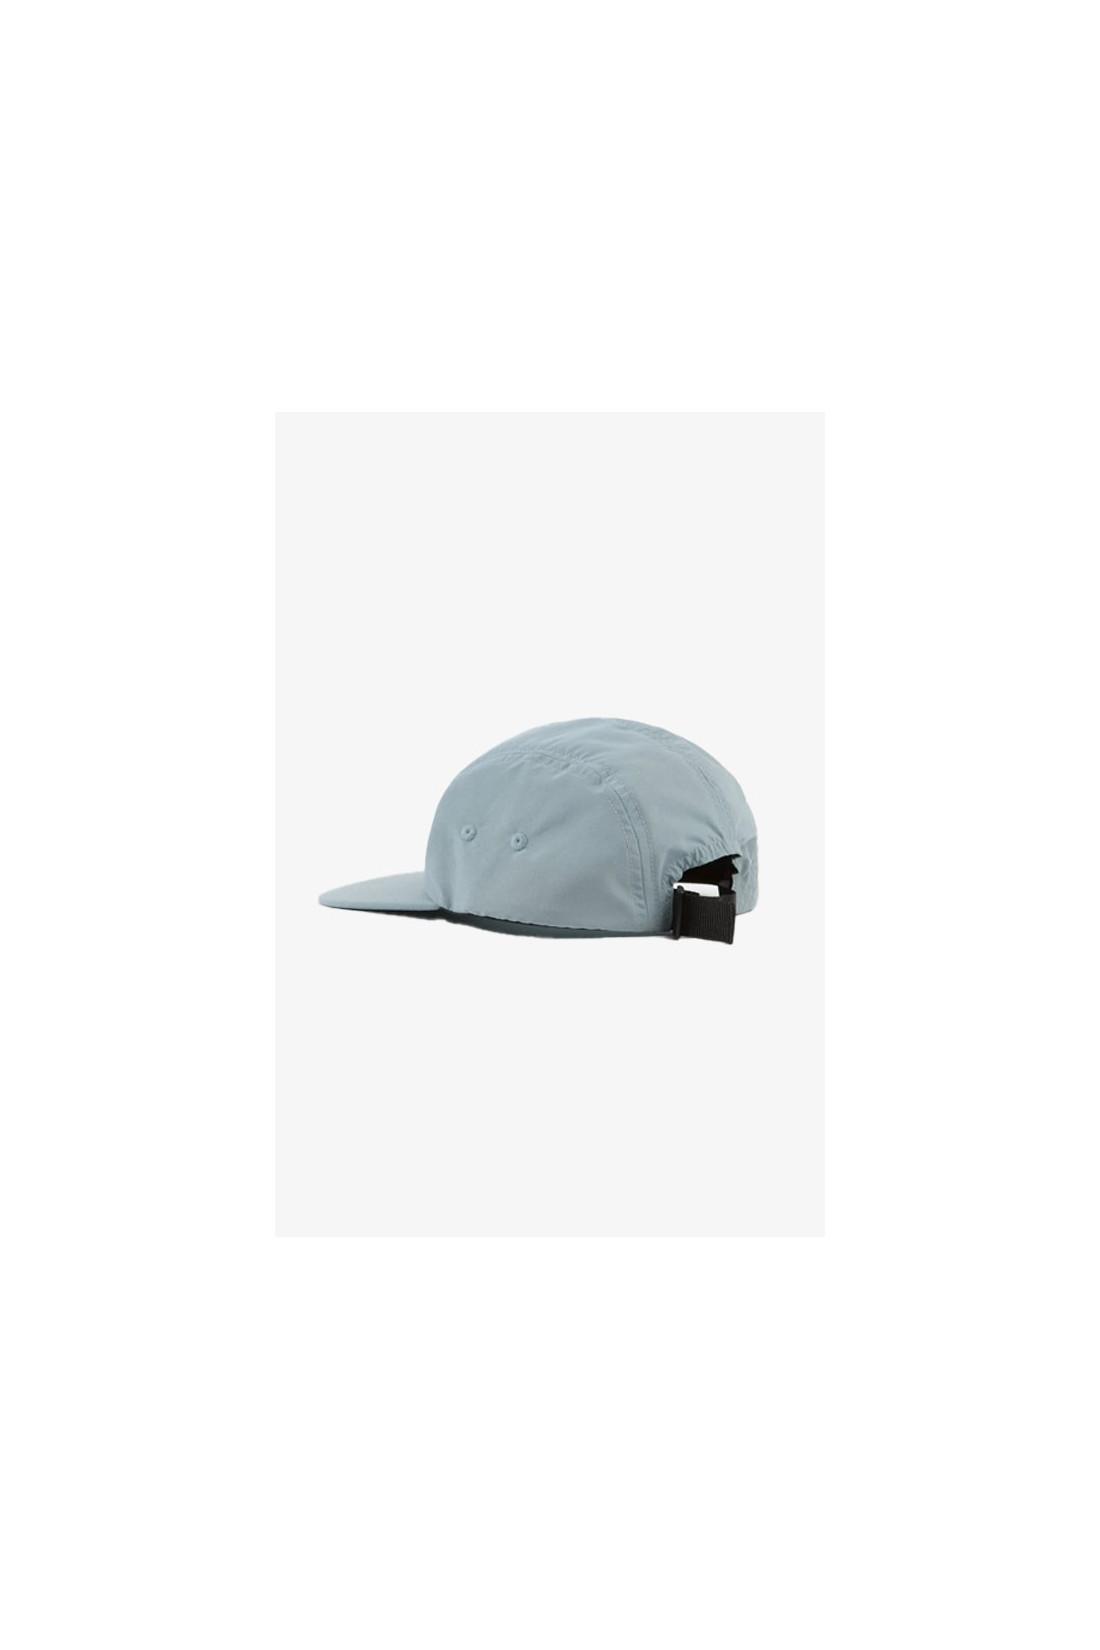 BATTENWEAR / Nylon travel cap Powder blue